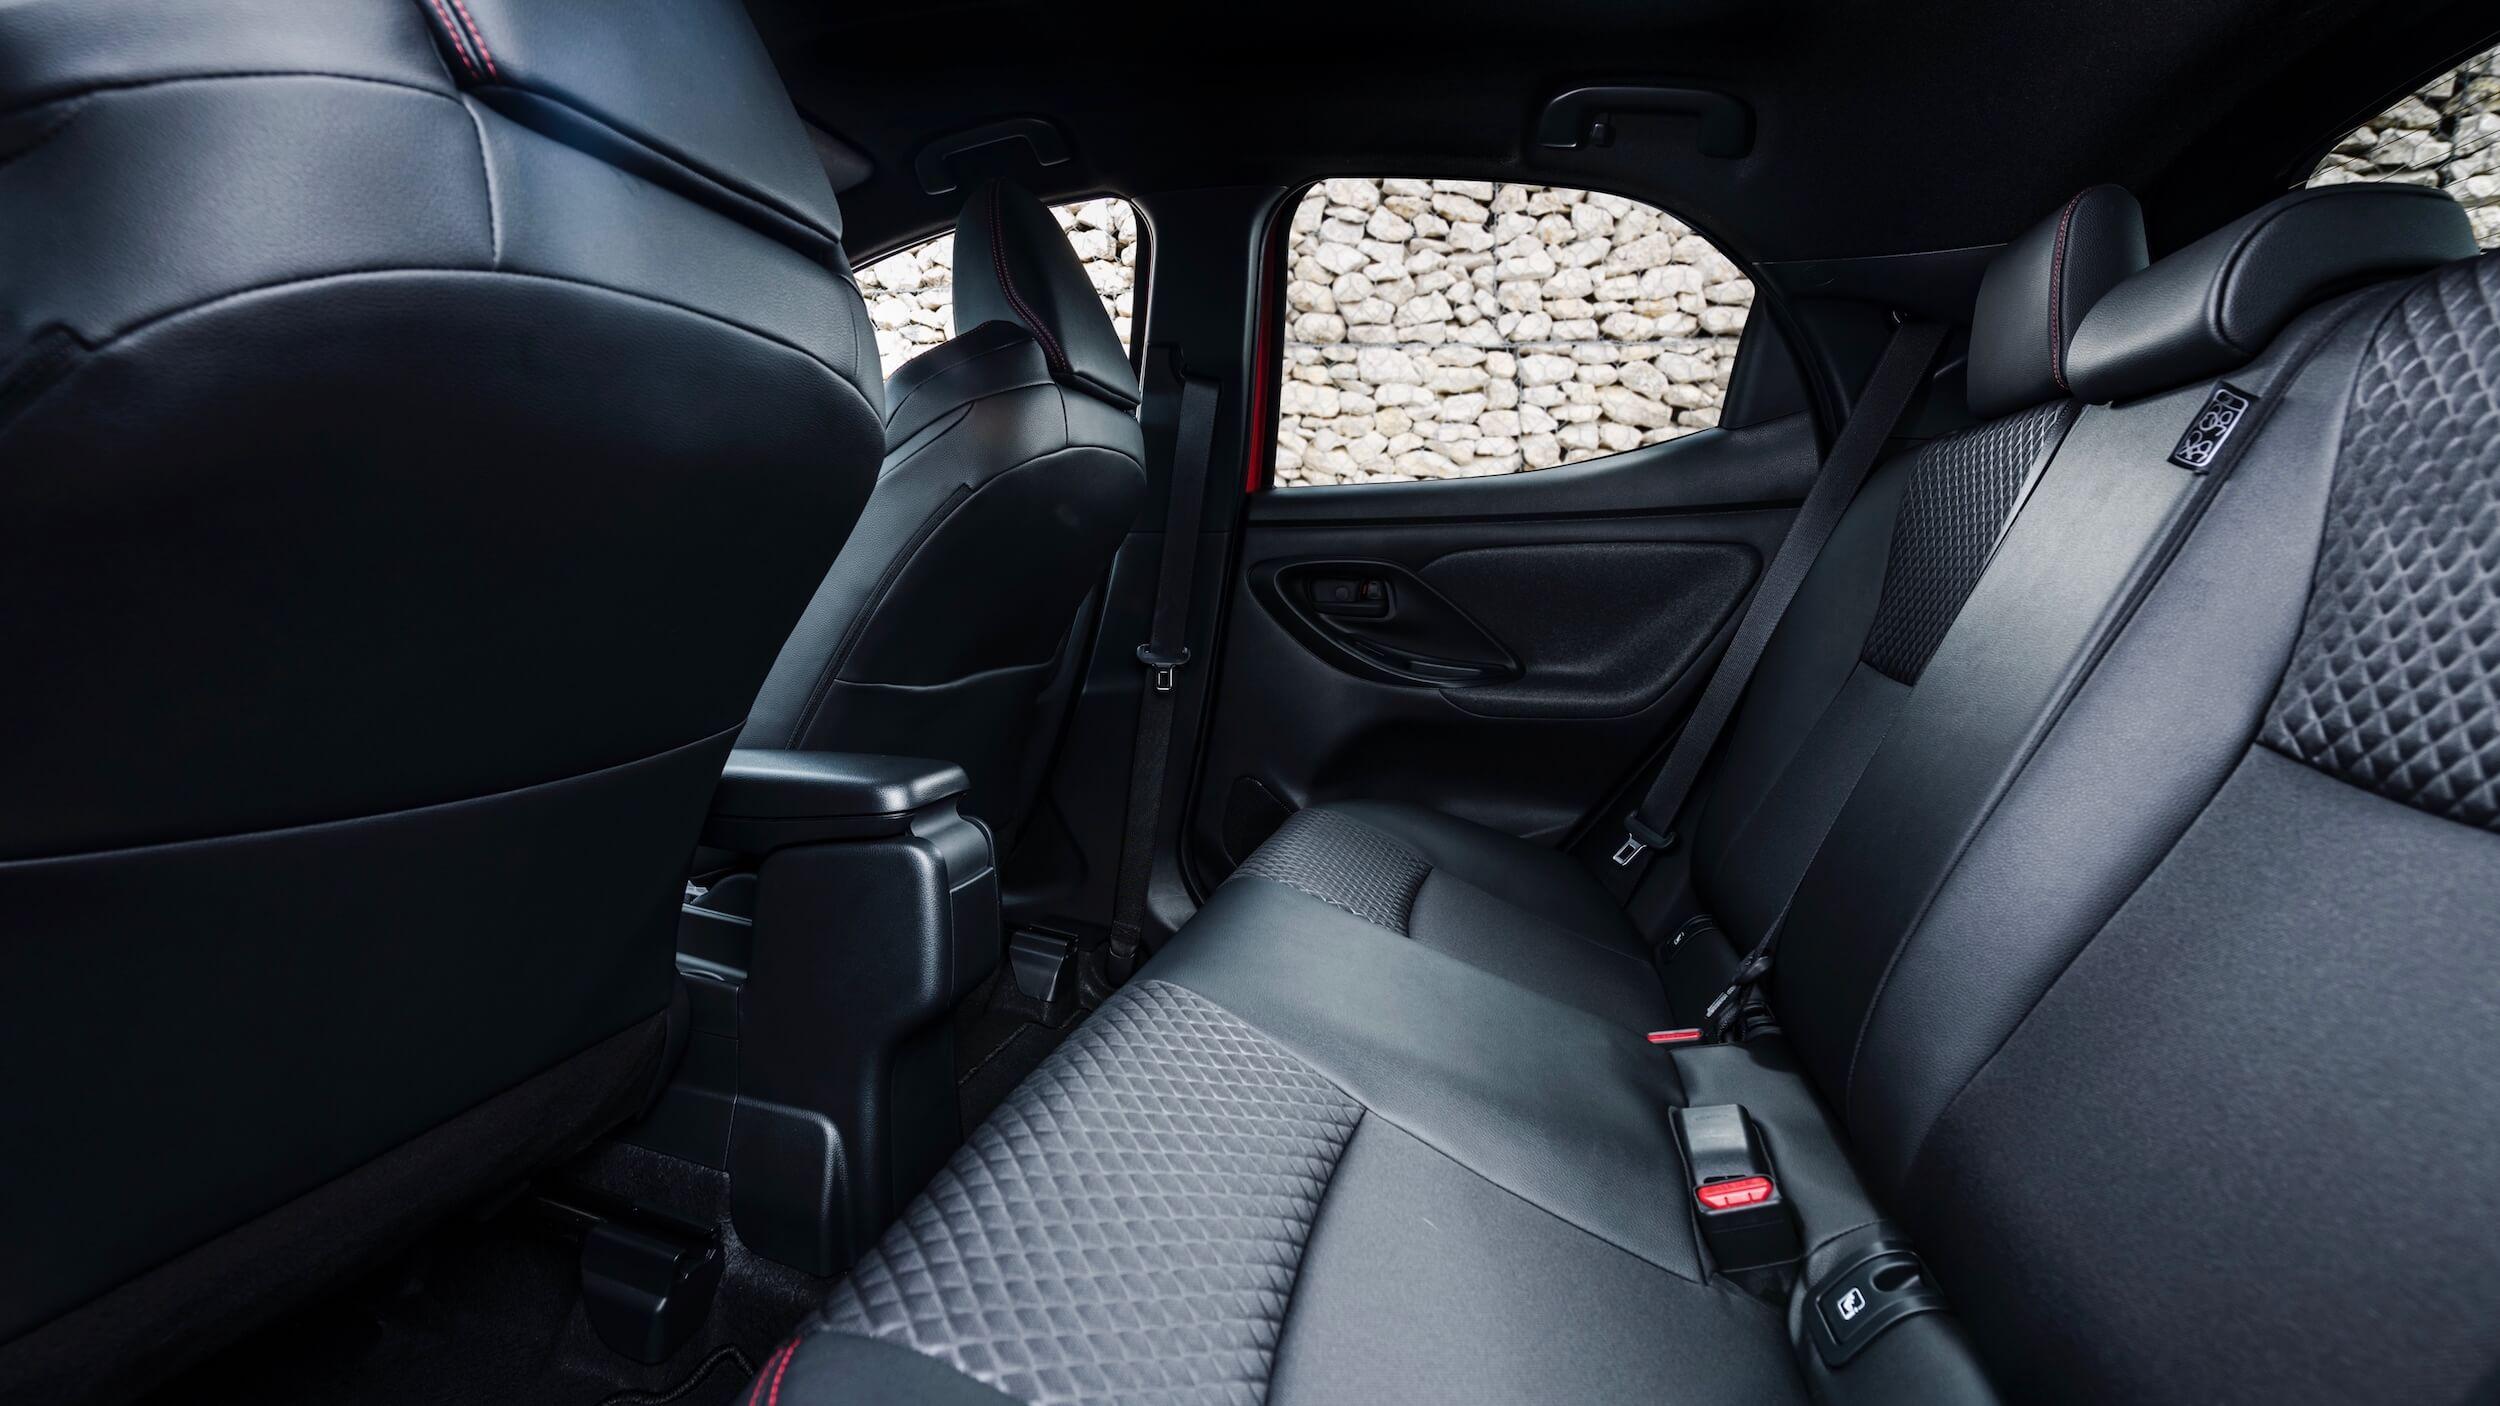 2020 Toyota Yaris hybride achterbank